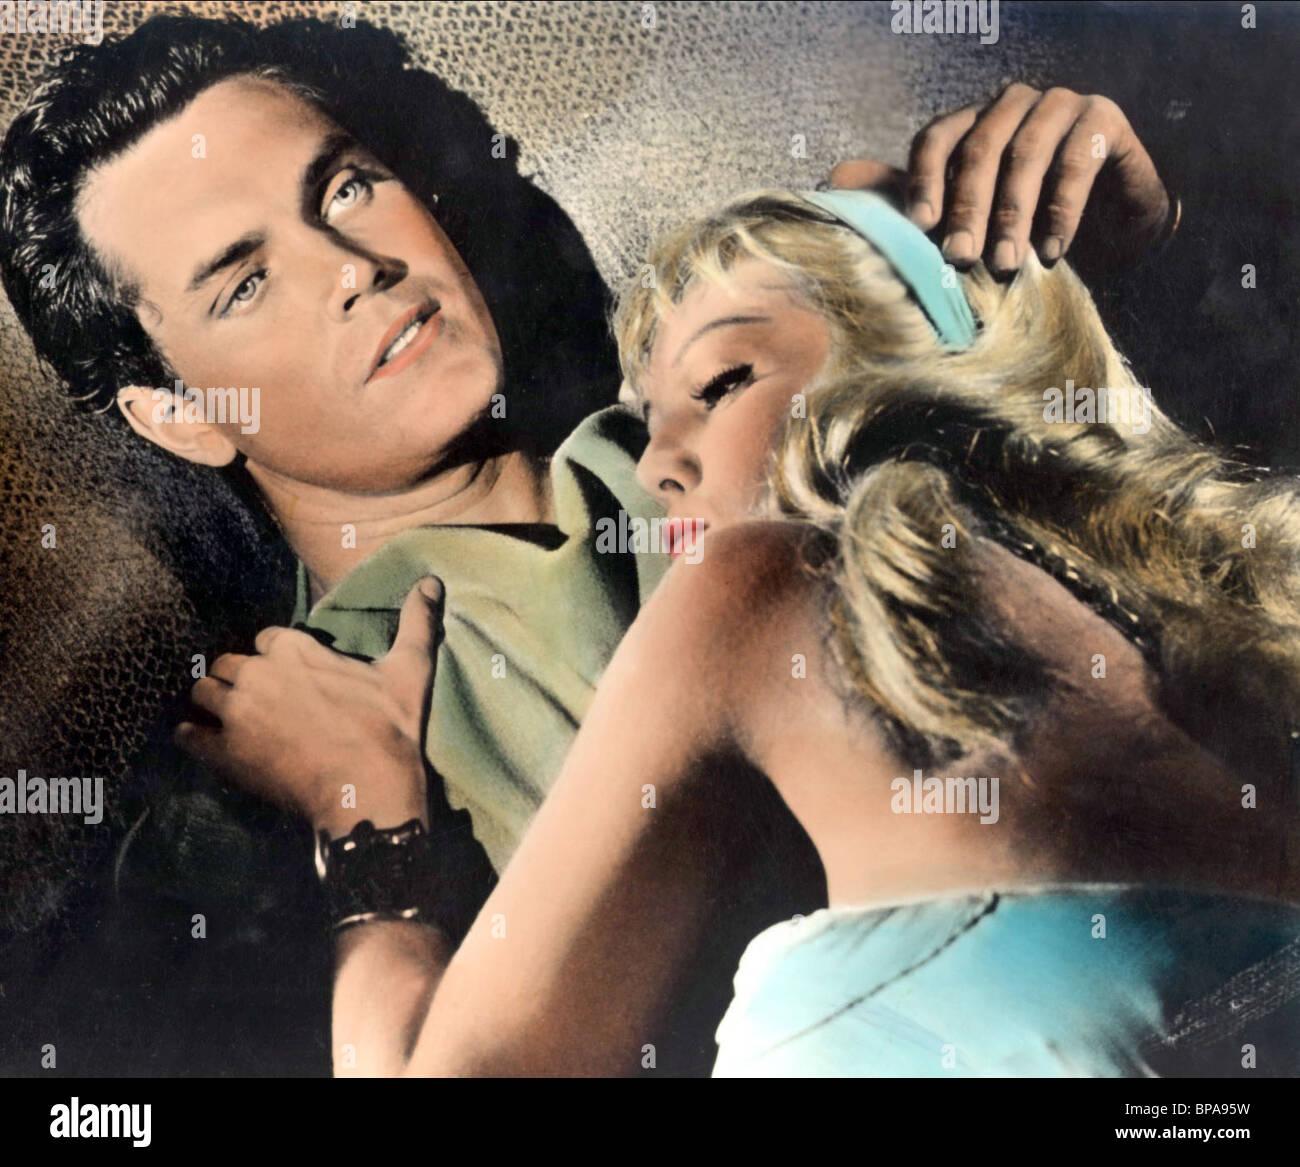 JEFFREY HUNTER, MYLENE DEMONGEOT, GOLD FOR THE CAESARS, 1963 - Stock Image